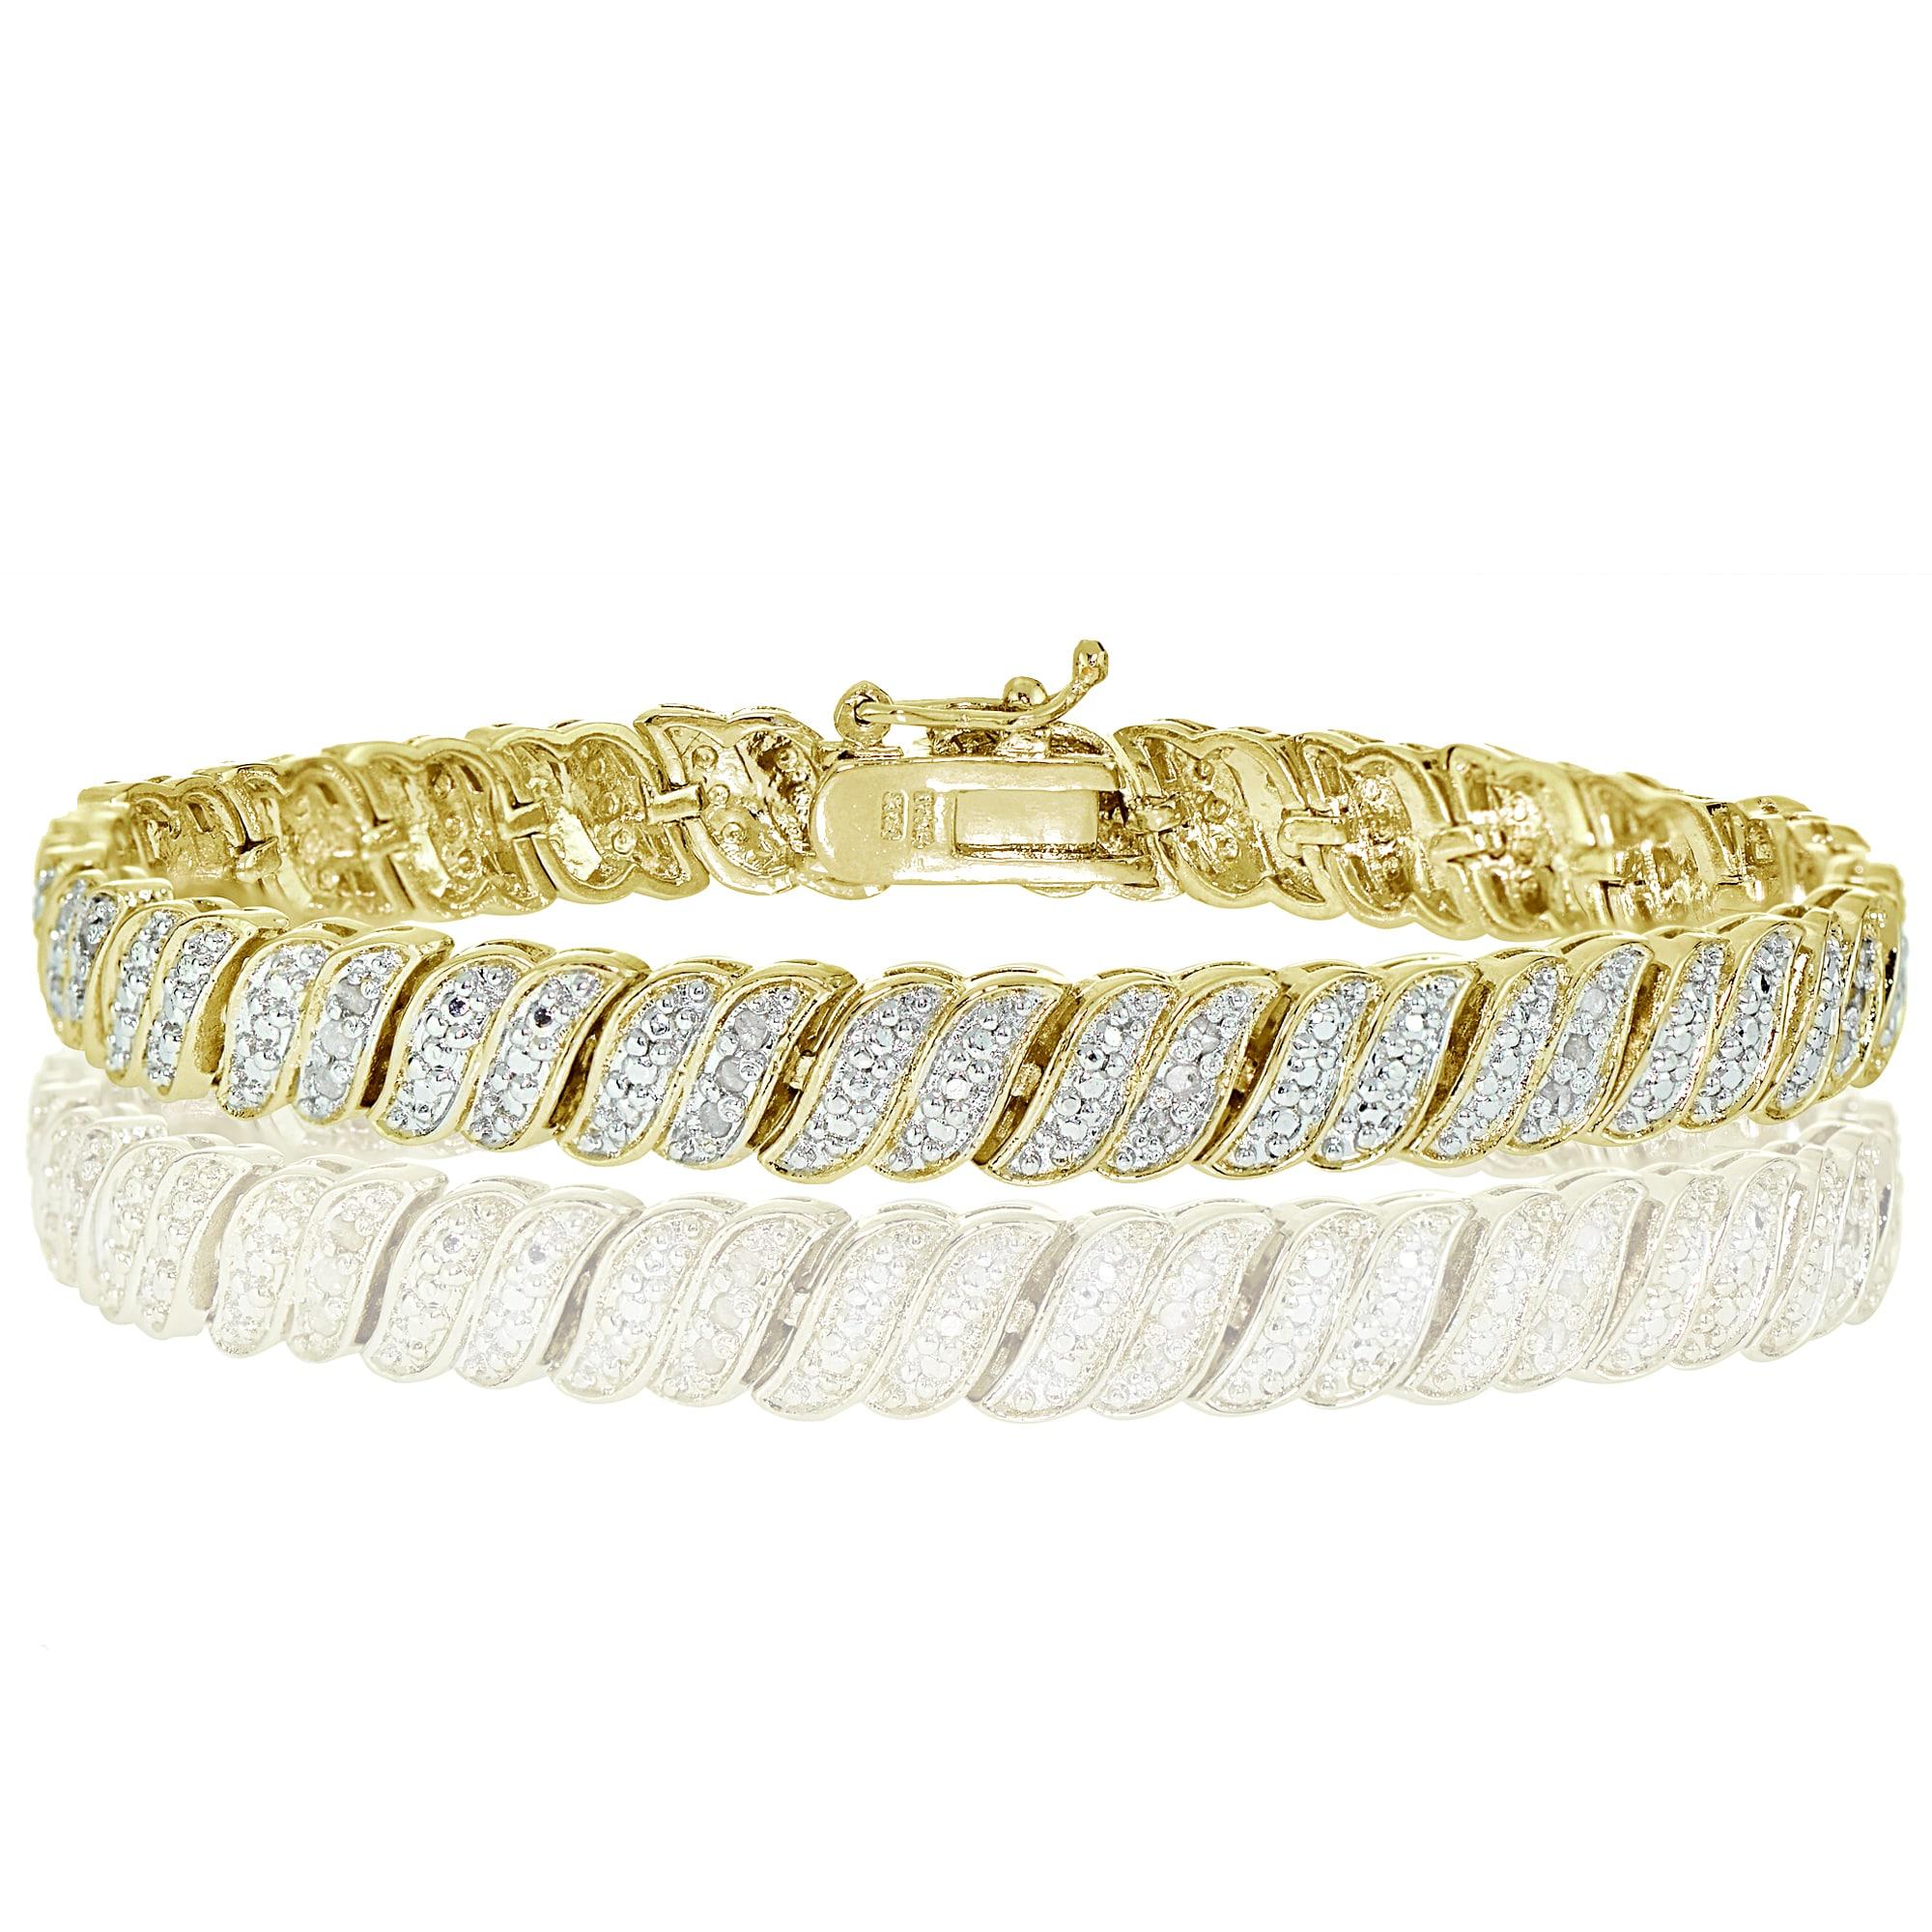 Yellow Diamond Bracelets Online At Our Best Deals